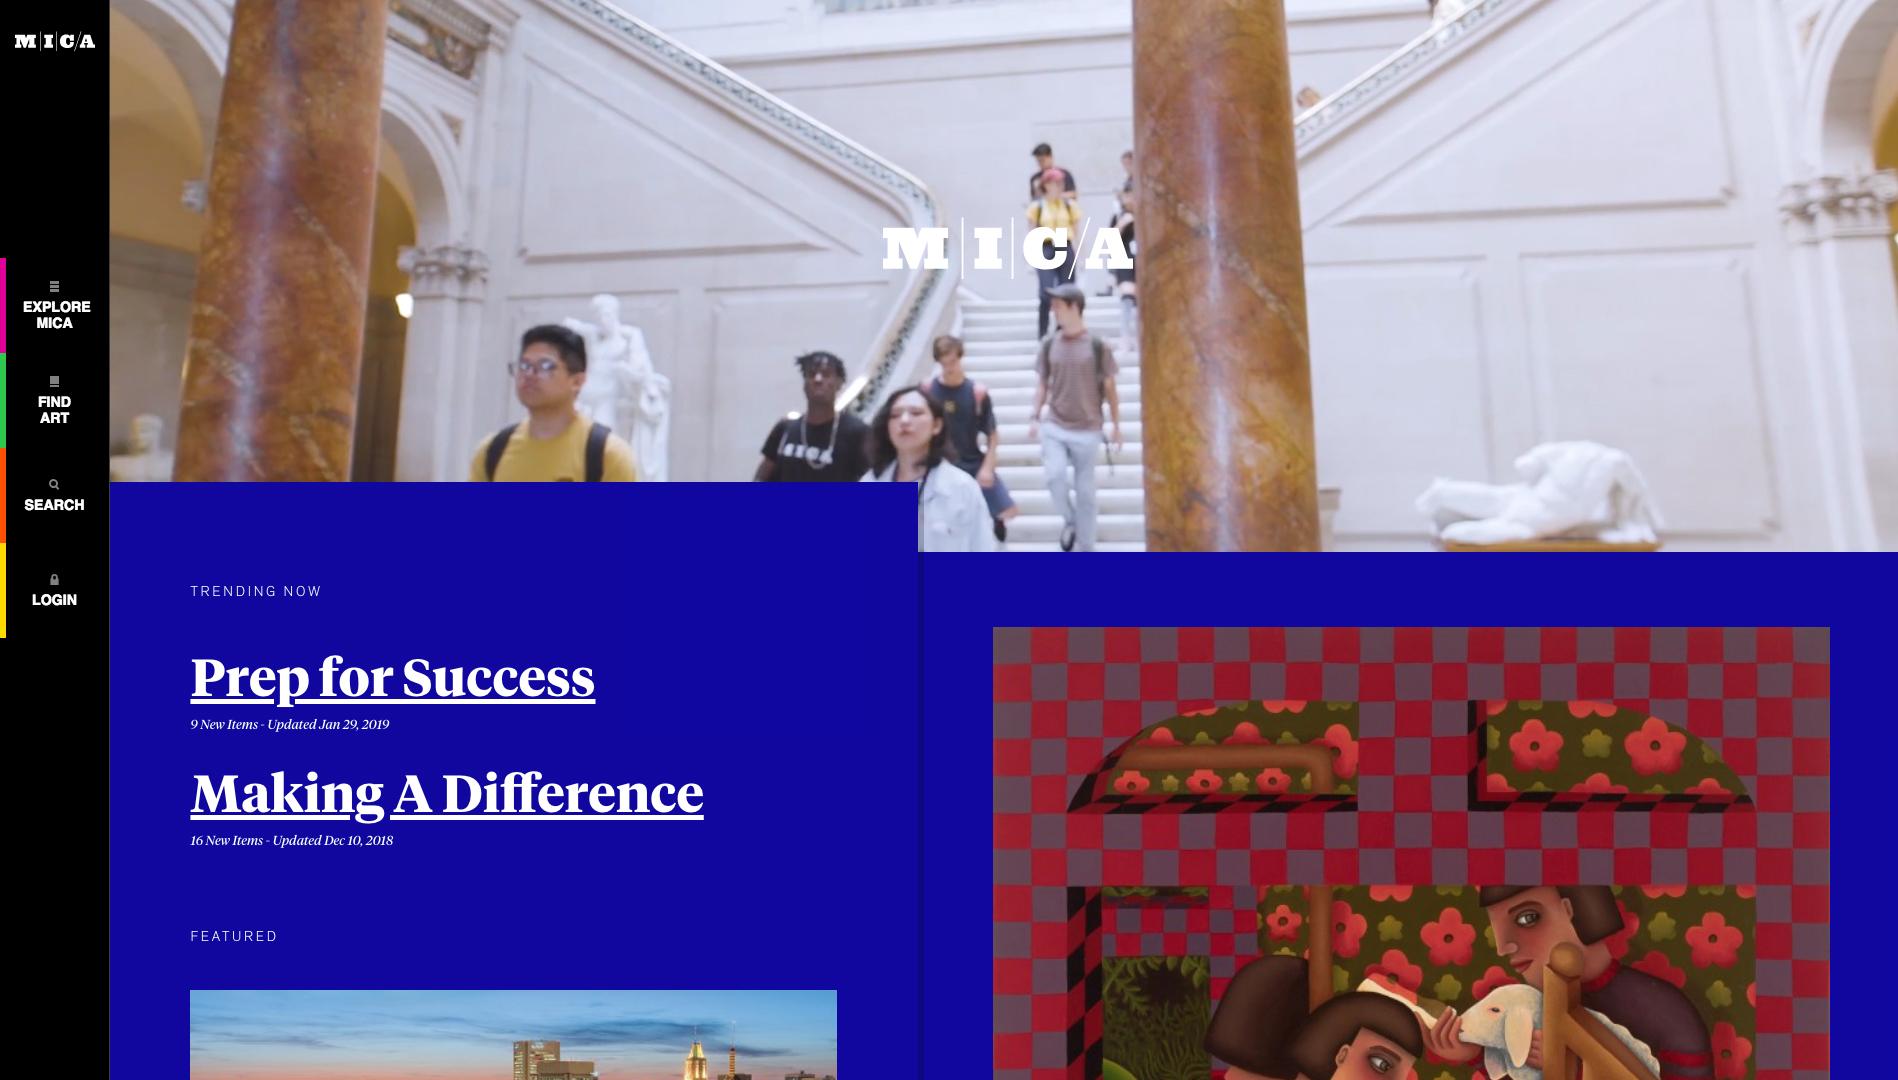 Mica homepage